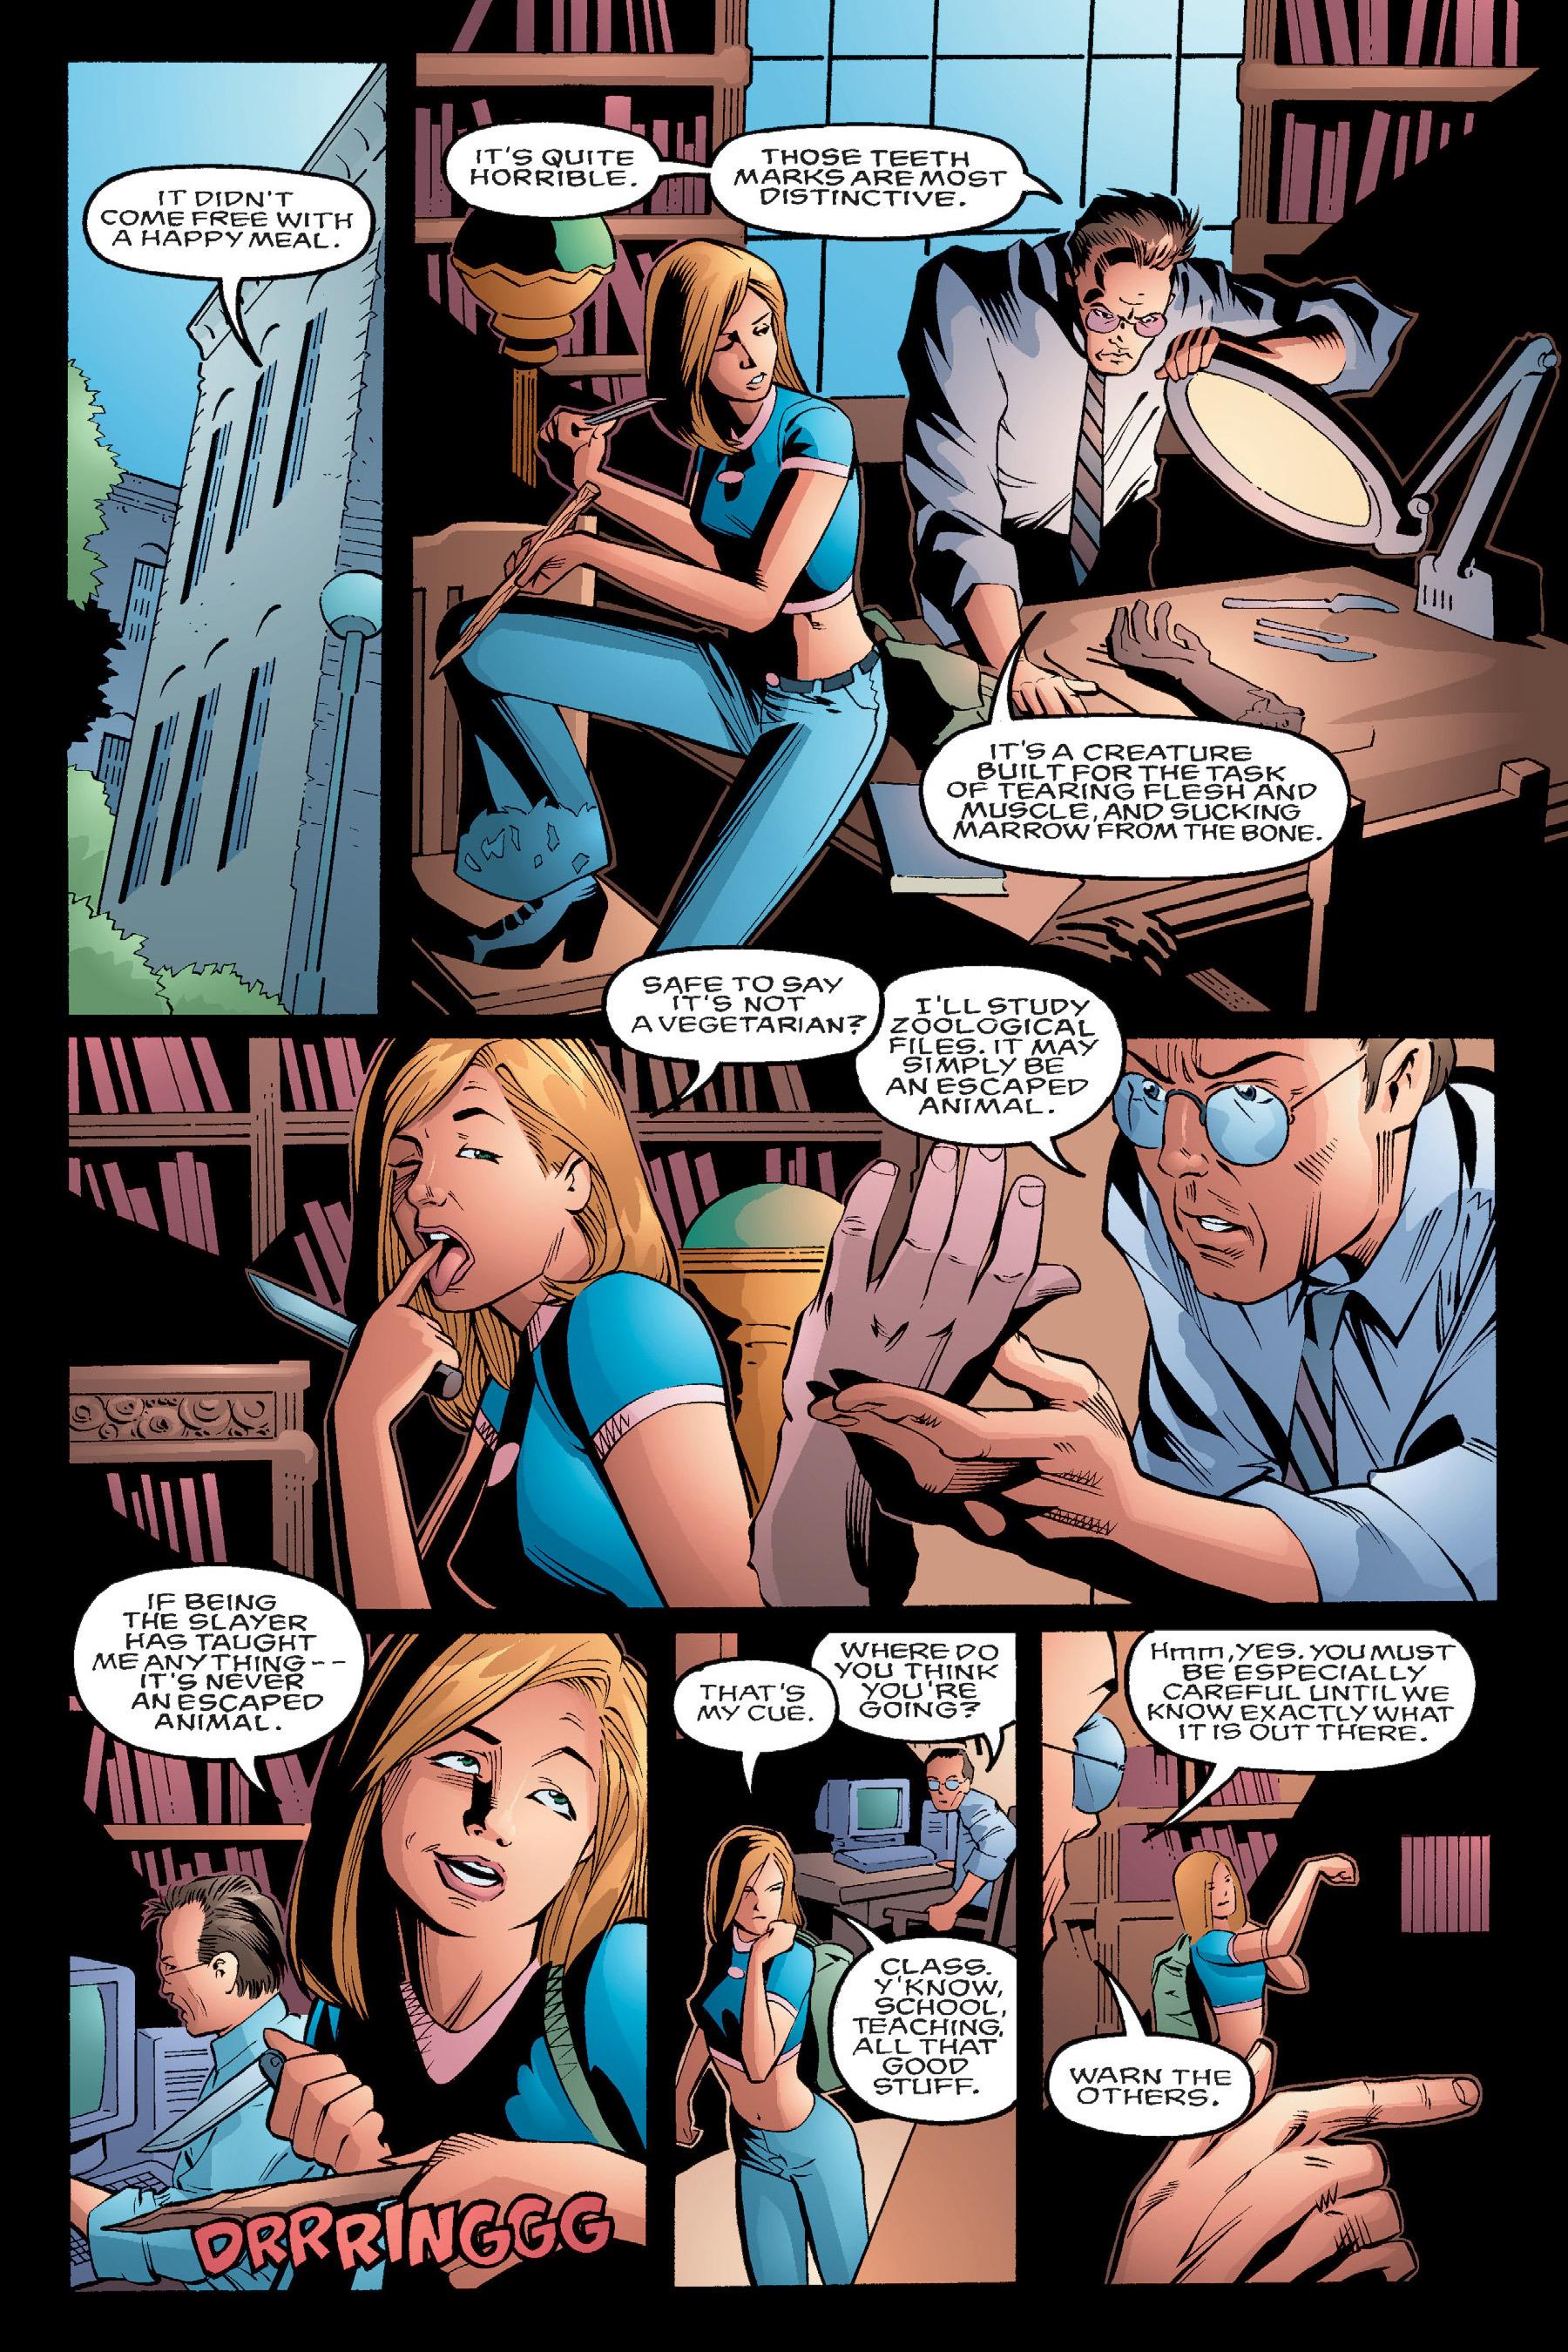 Read online Buffy the Vampire Slayer: Omnibus comic -  Issue # TPB 4 - 14